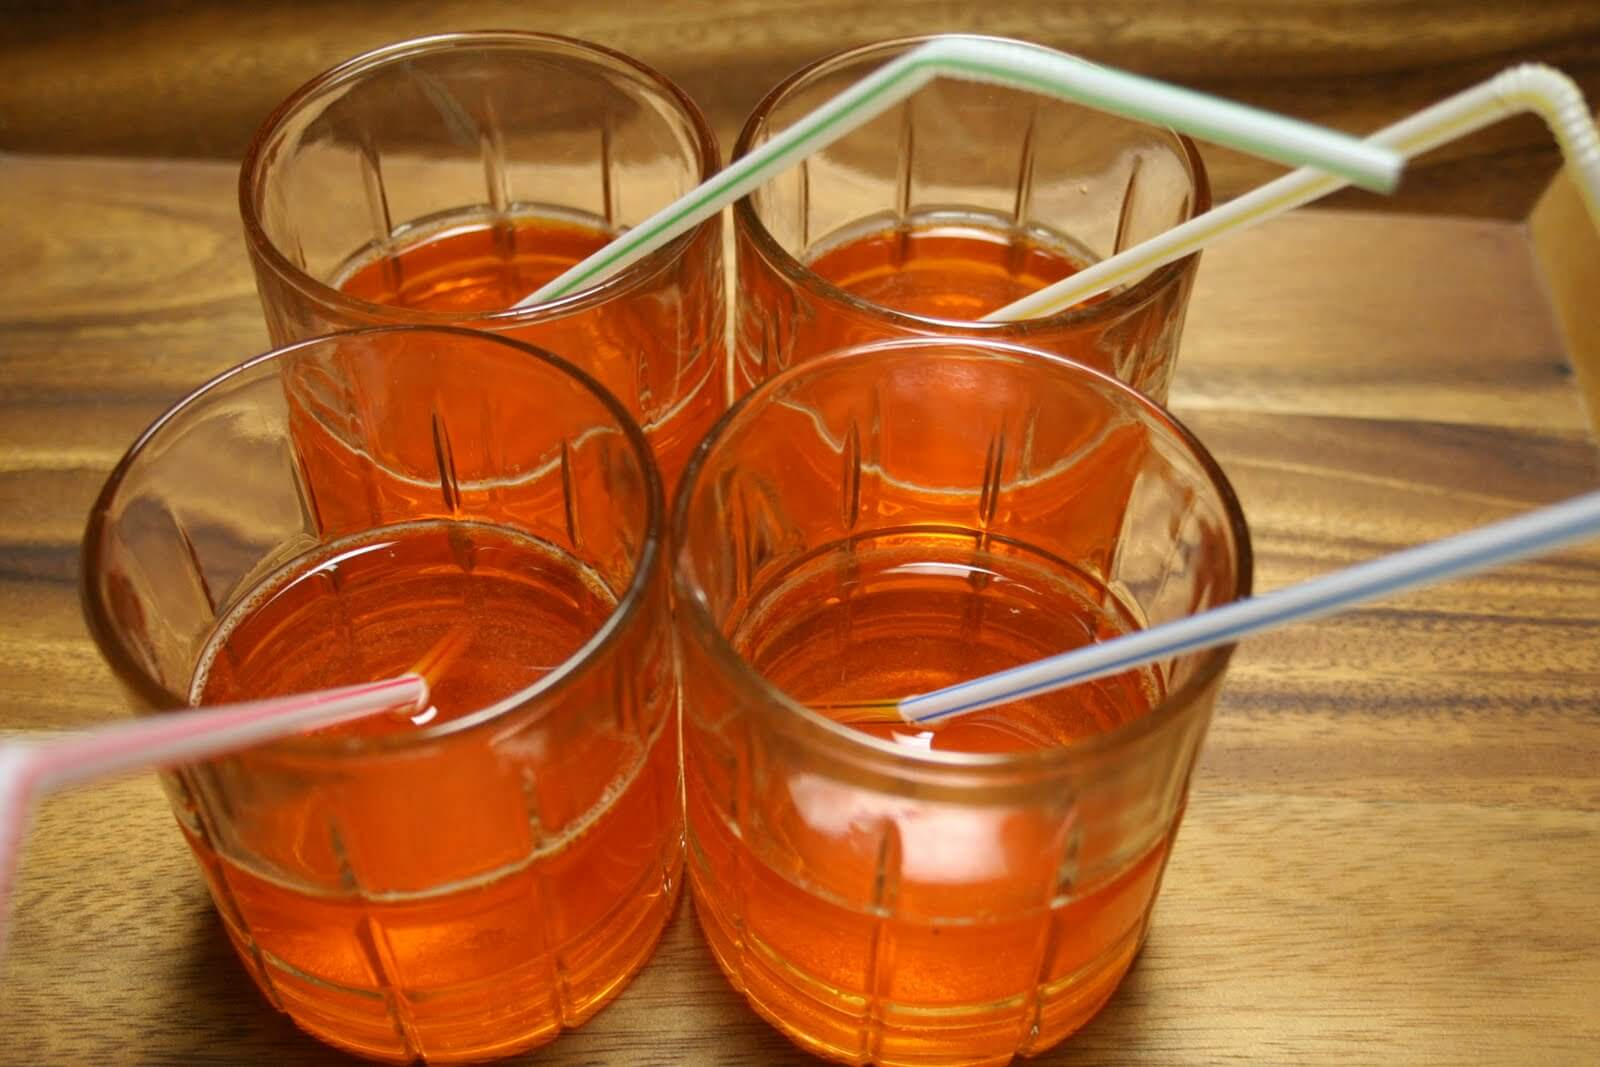 how to make jello with kool aid